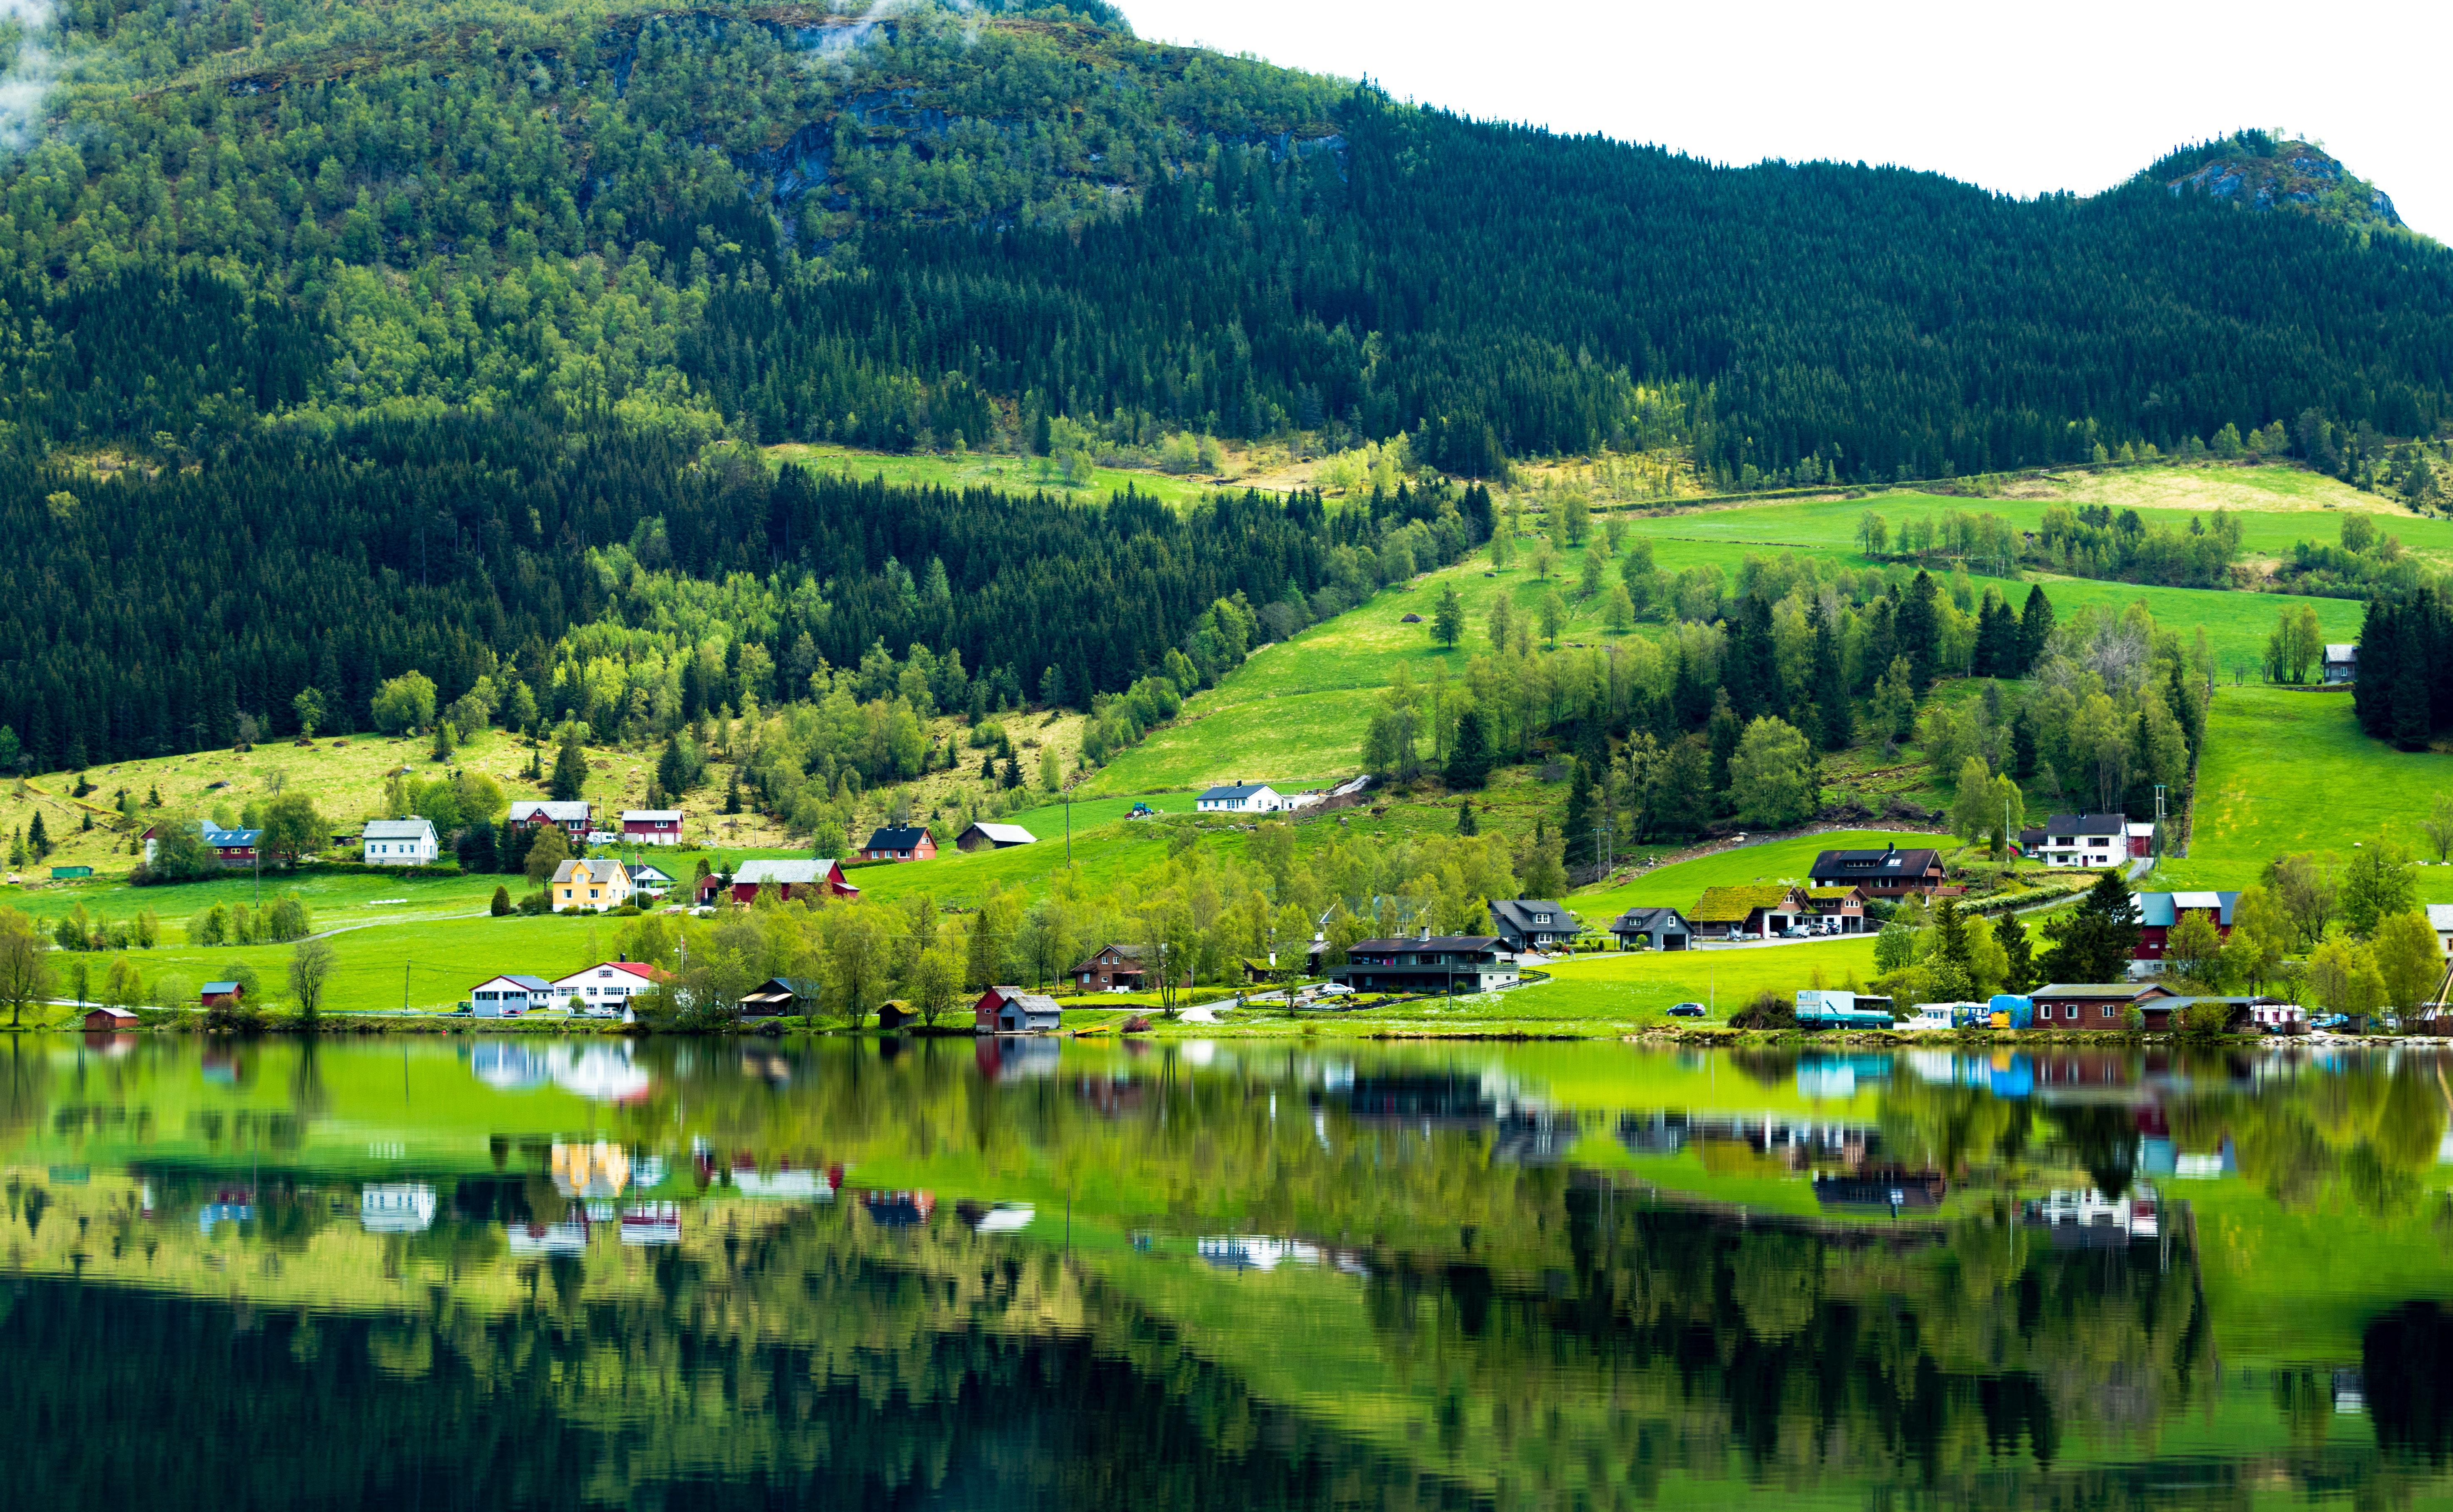 River near green grass field photo